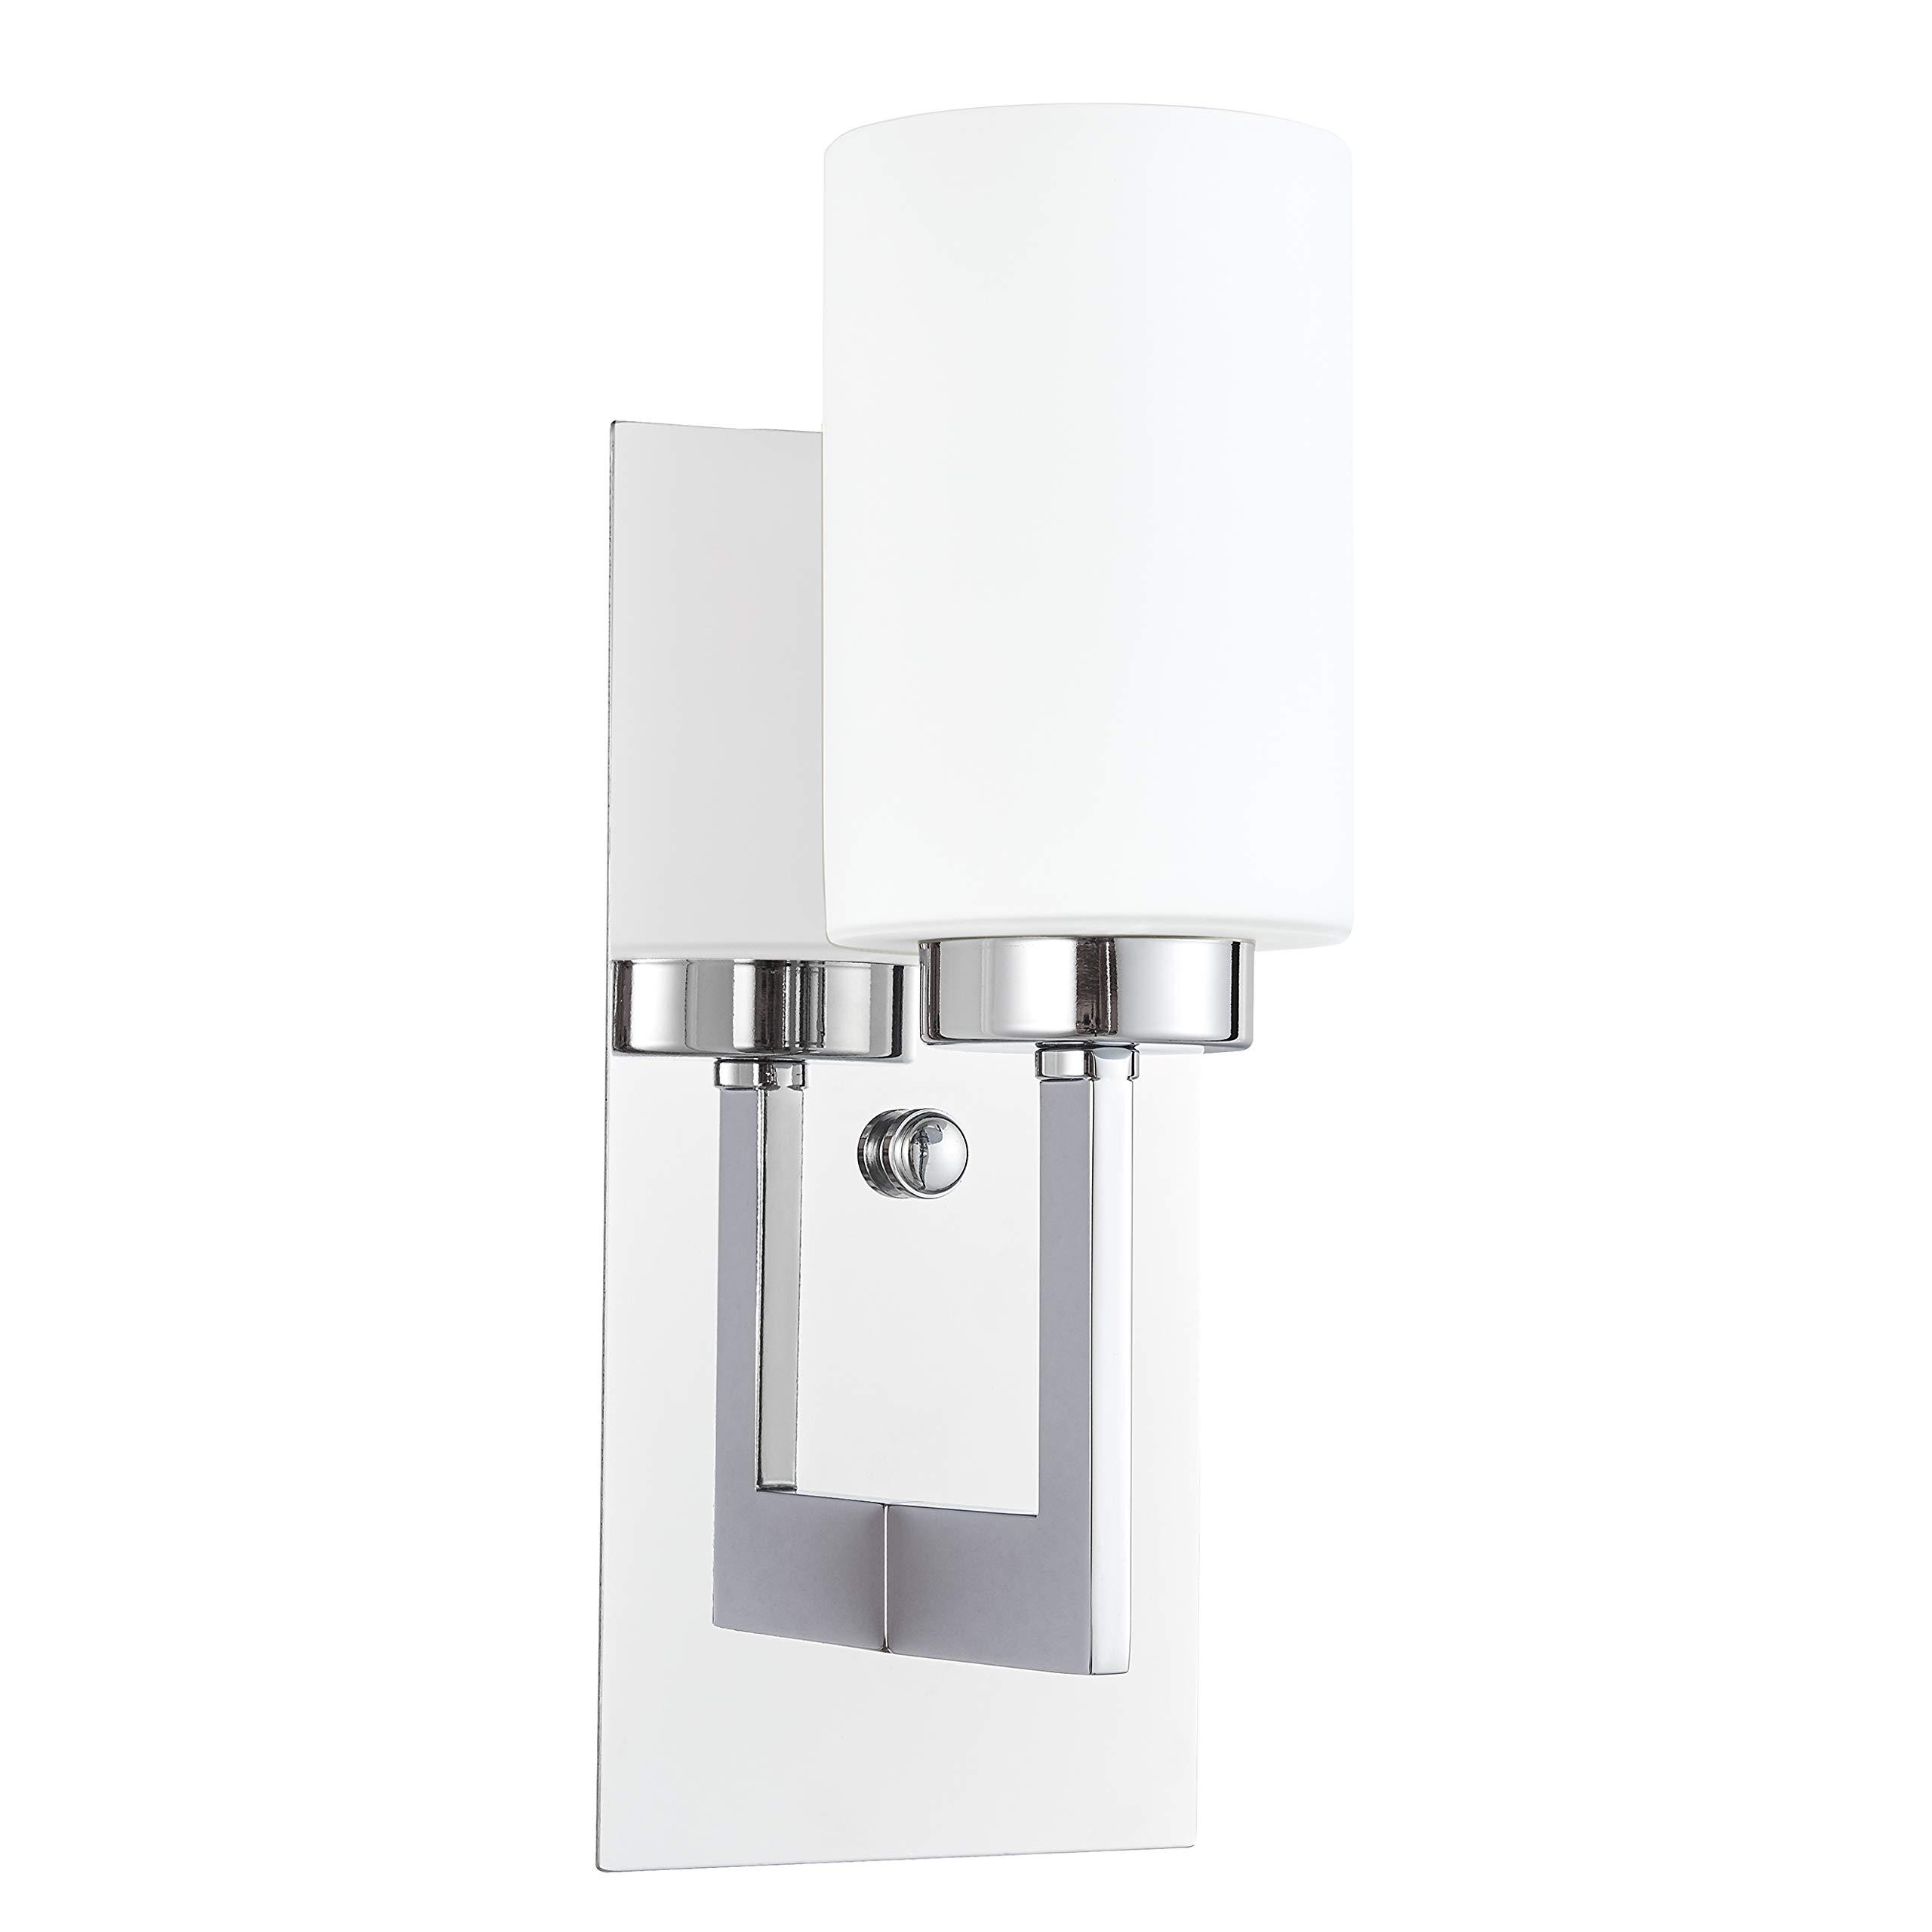 Brio wall sconce light fixture chrome bathroom vanity wall fixtures ll wl151 pc